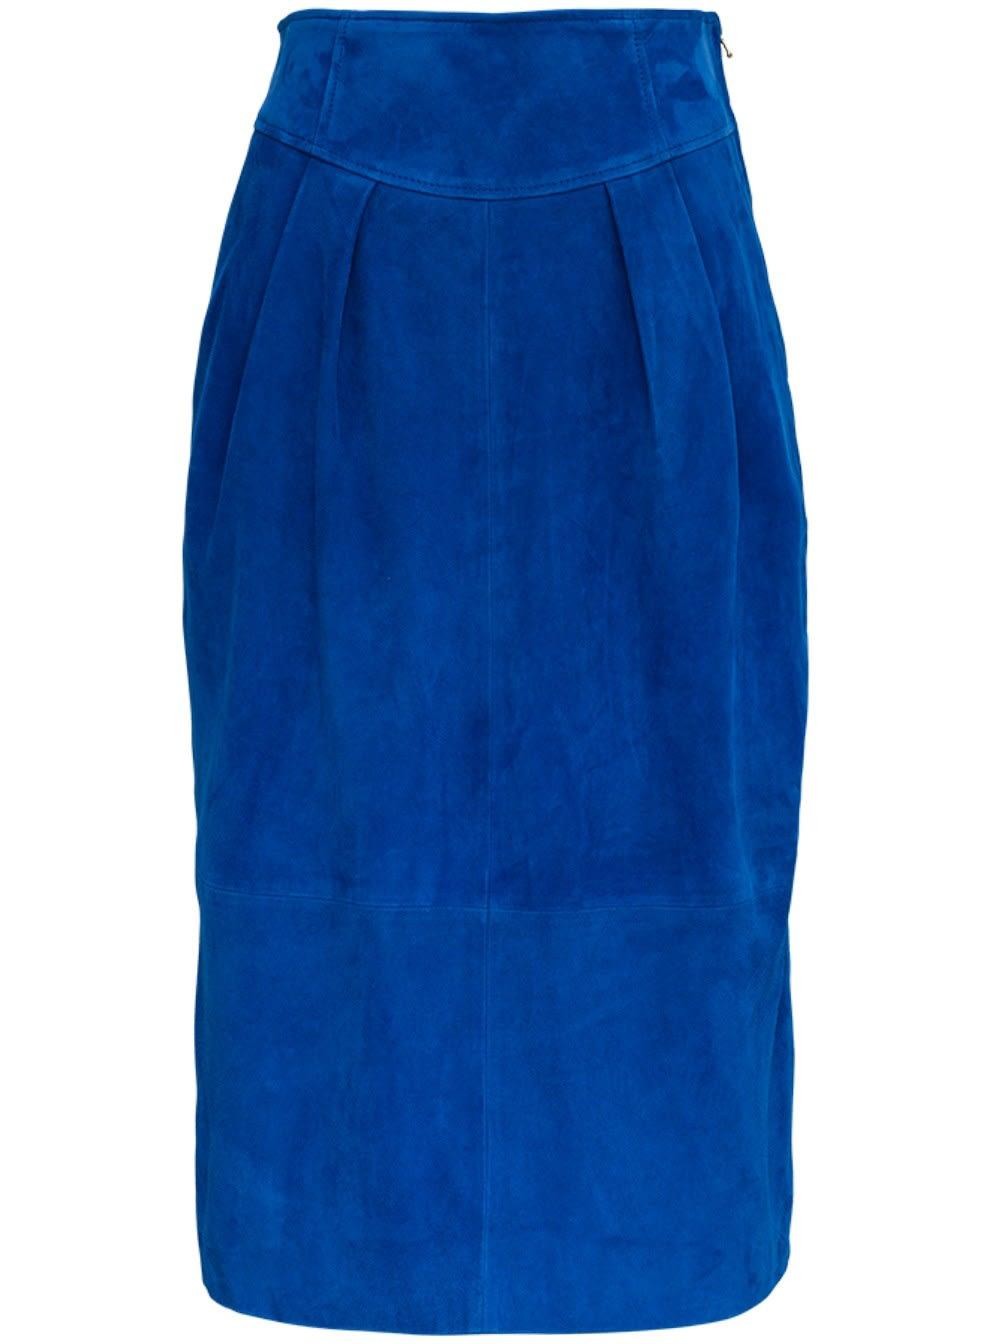 Alberta Ferretti Long Blue Suede Skirt